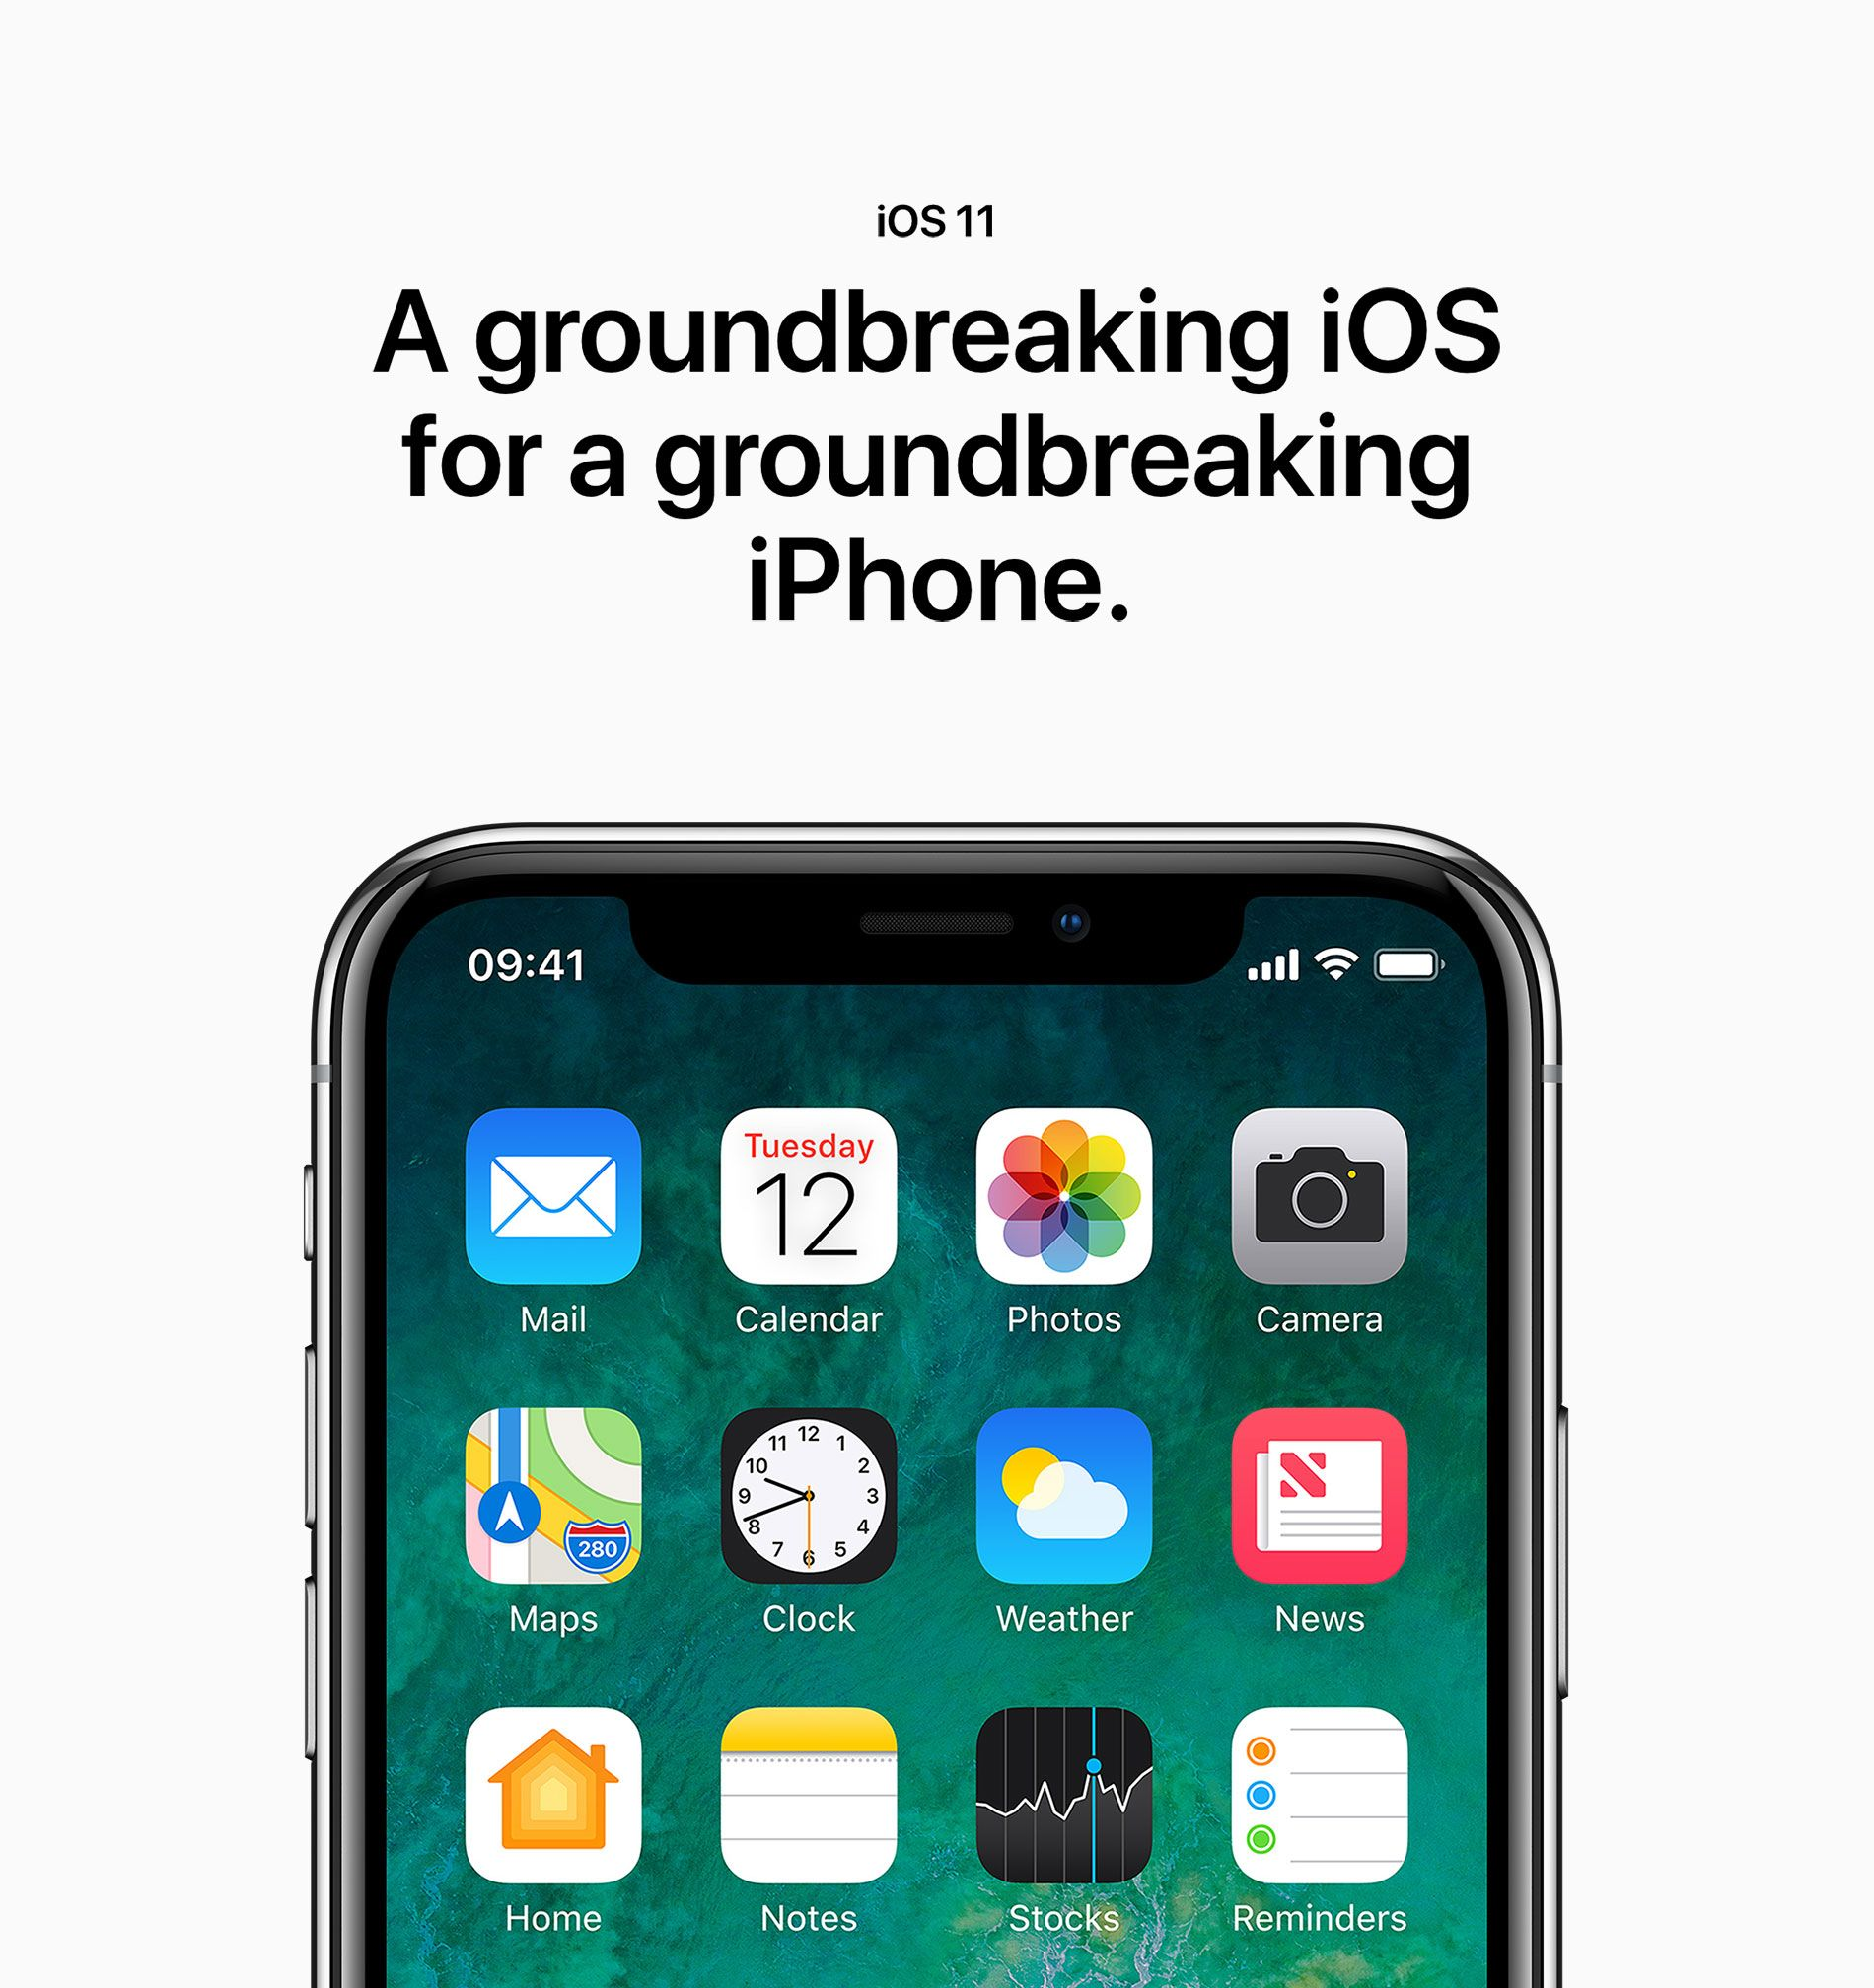 iOS 11 - A groundbreaking iOS for a groundbreaking iPhone.